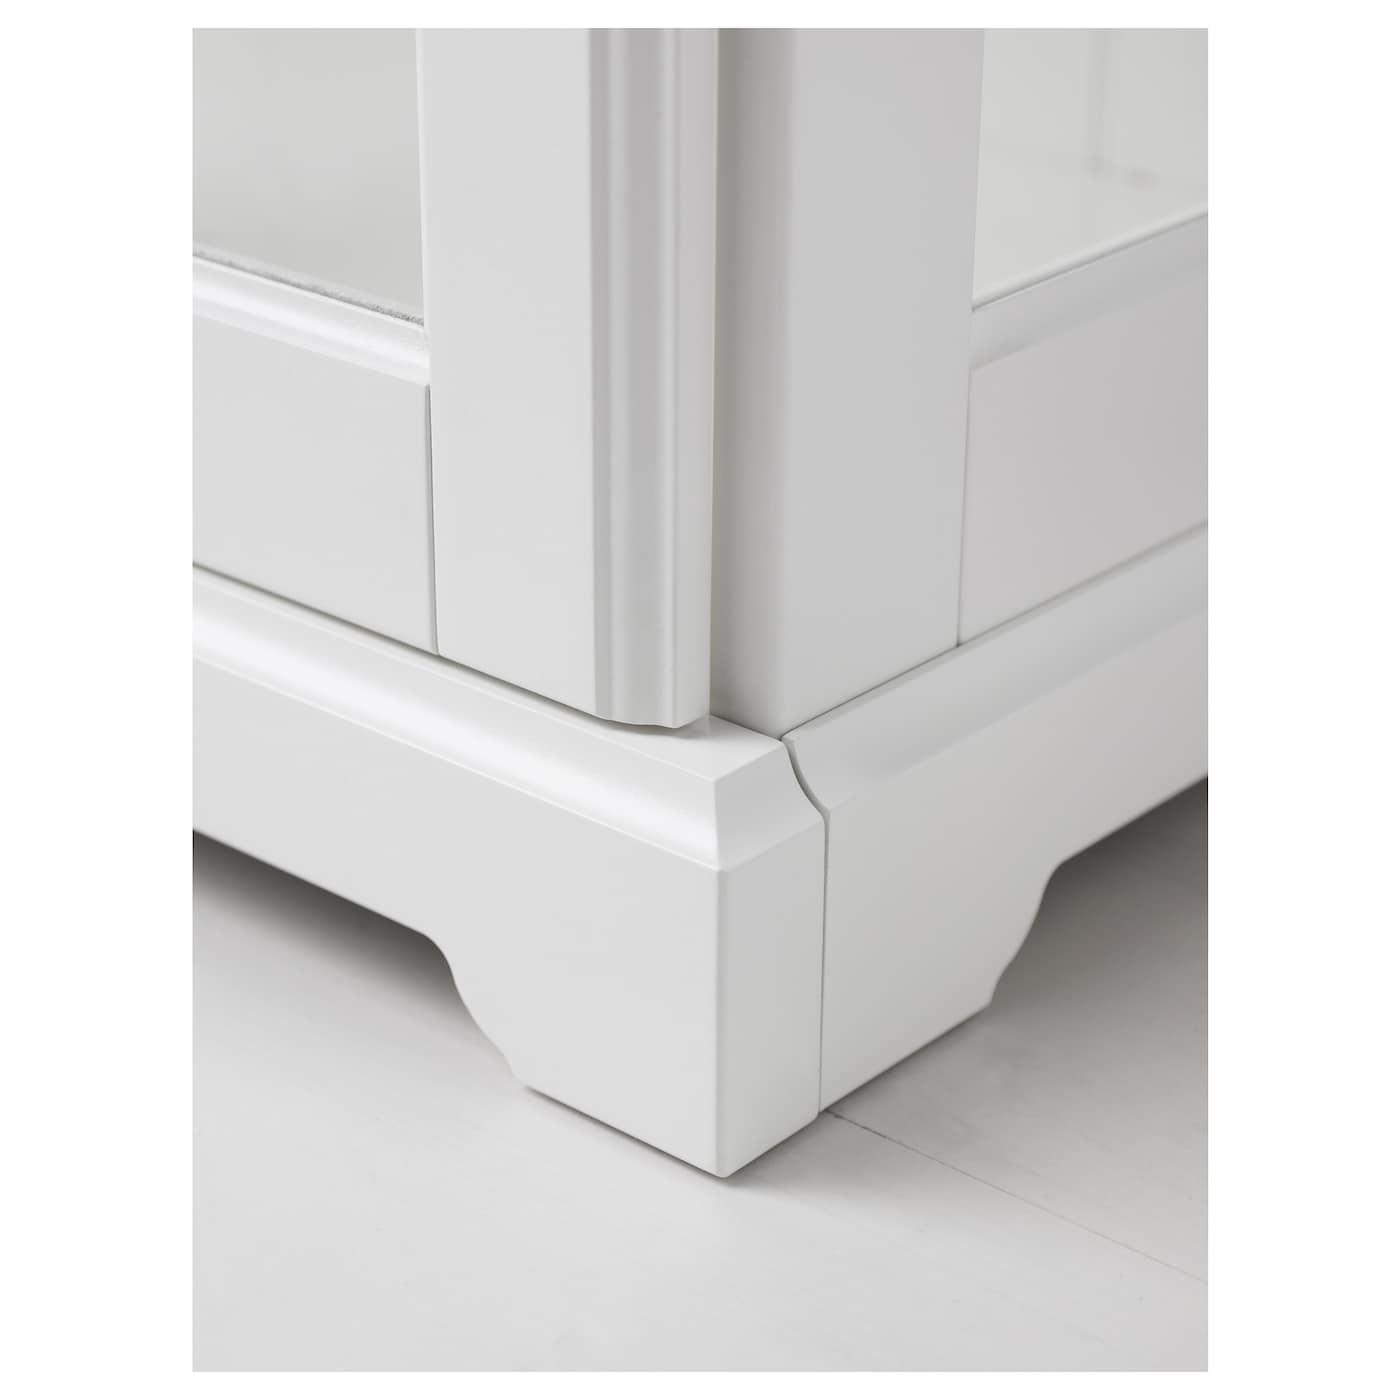 liatorp glass door cabinet white 96 x 214 cm ikea. Black Bedroom Furniture Sets. Home Design Ideas